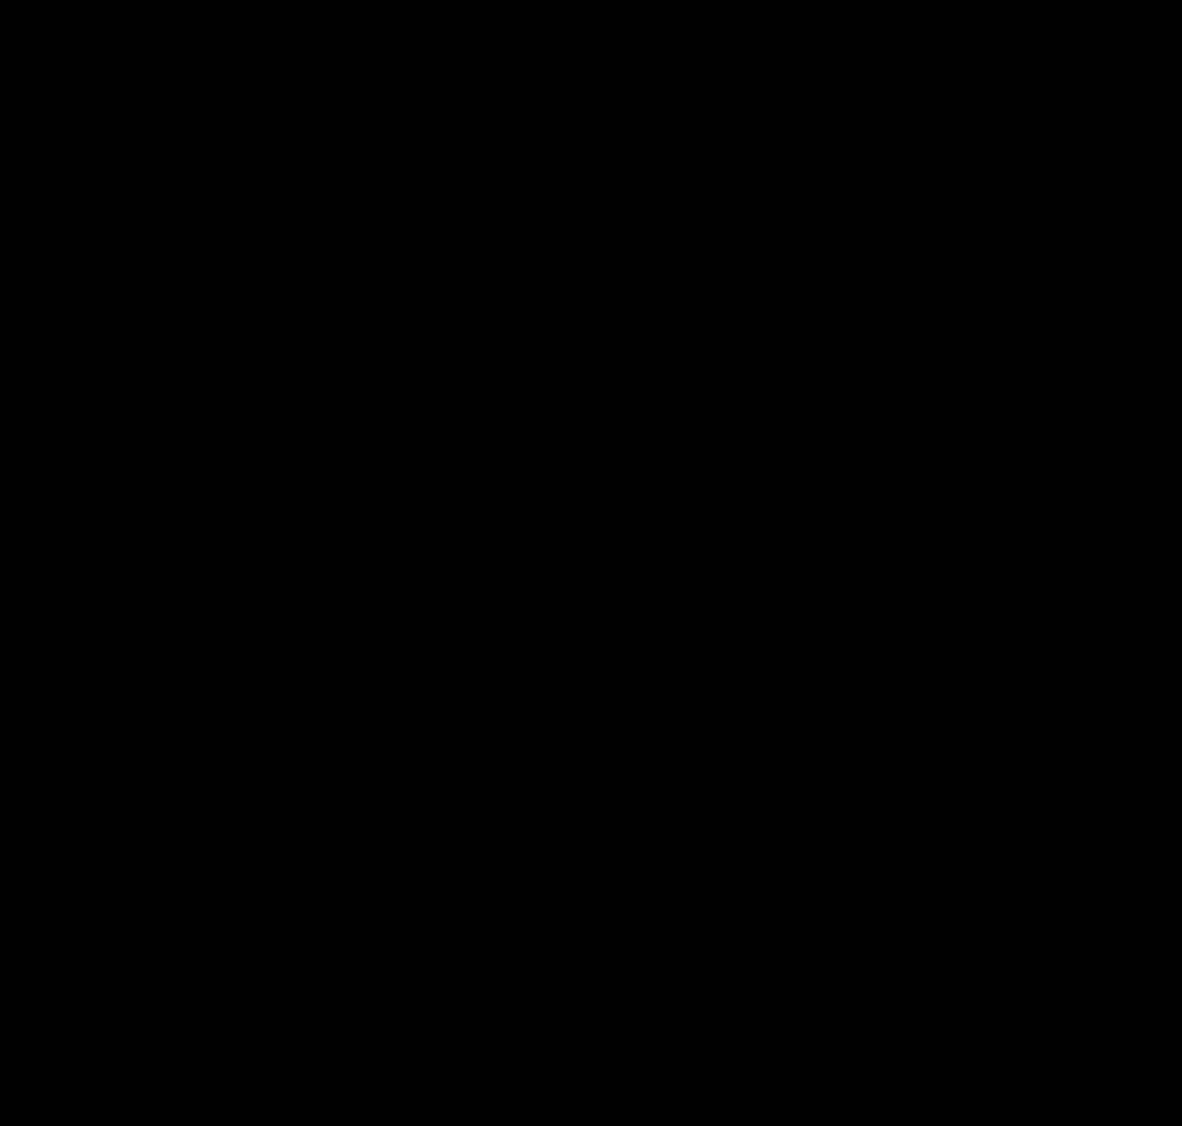 3-Fluoro-4-(4-tetrahydropyranylamino)benzeneboronic acid pinacol ester